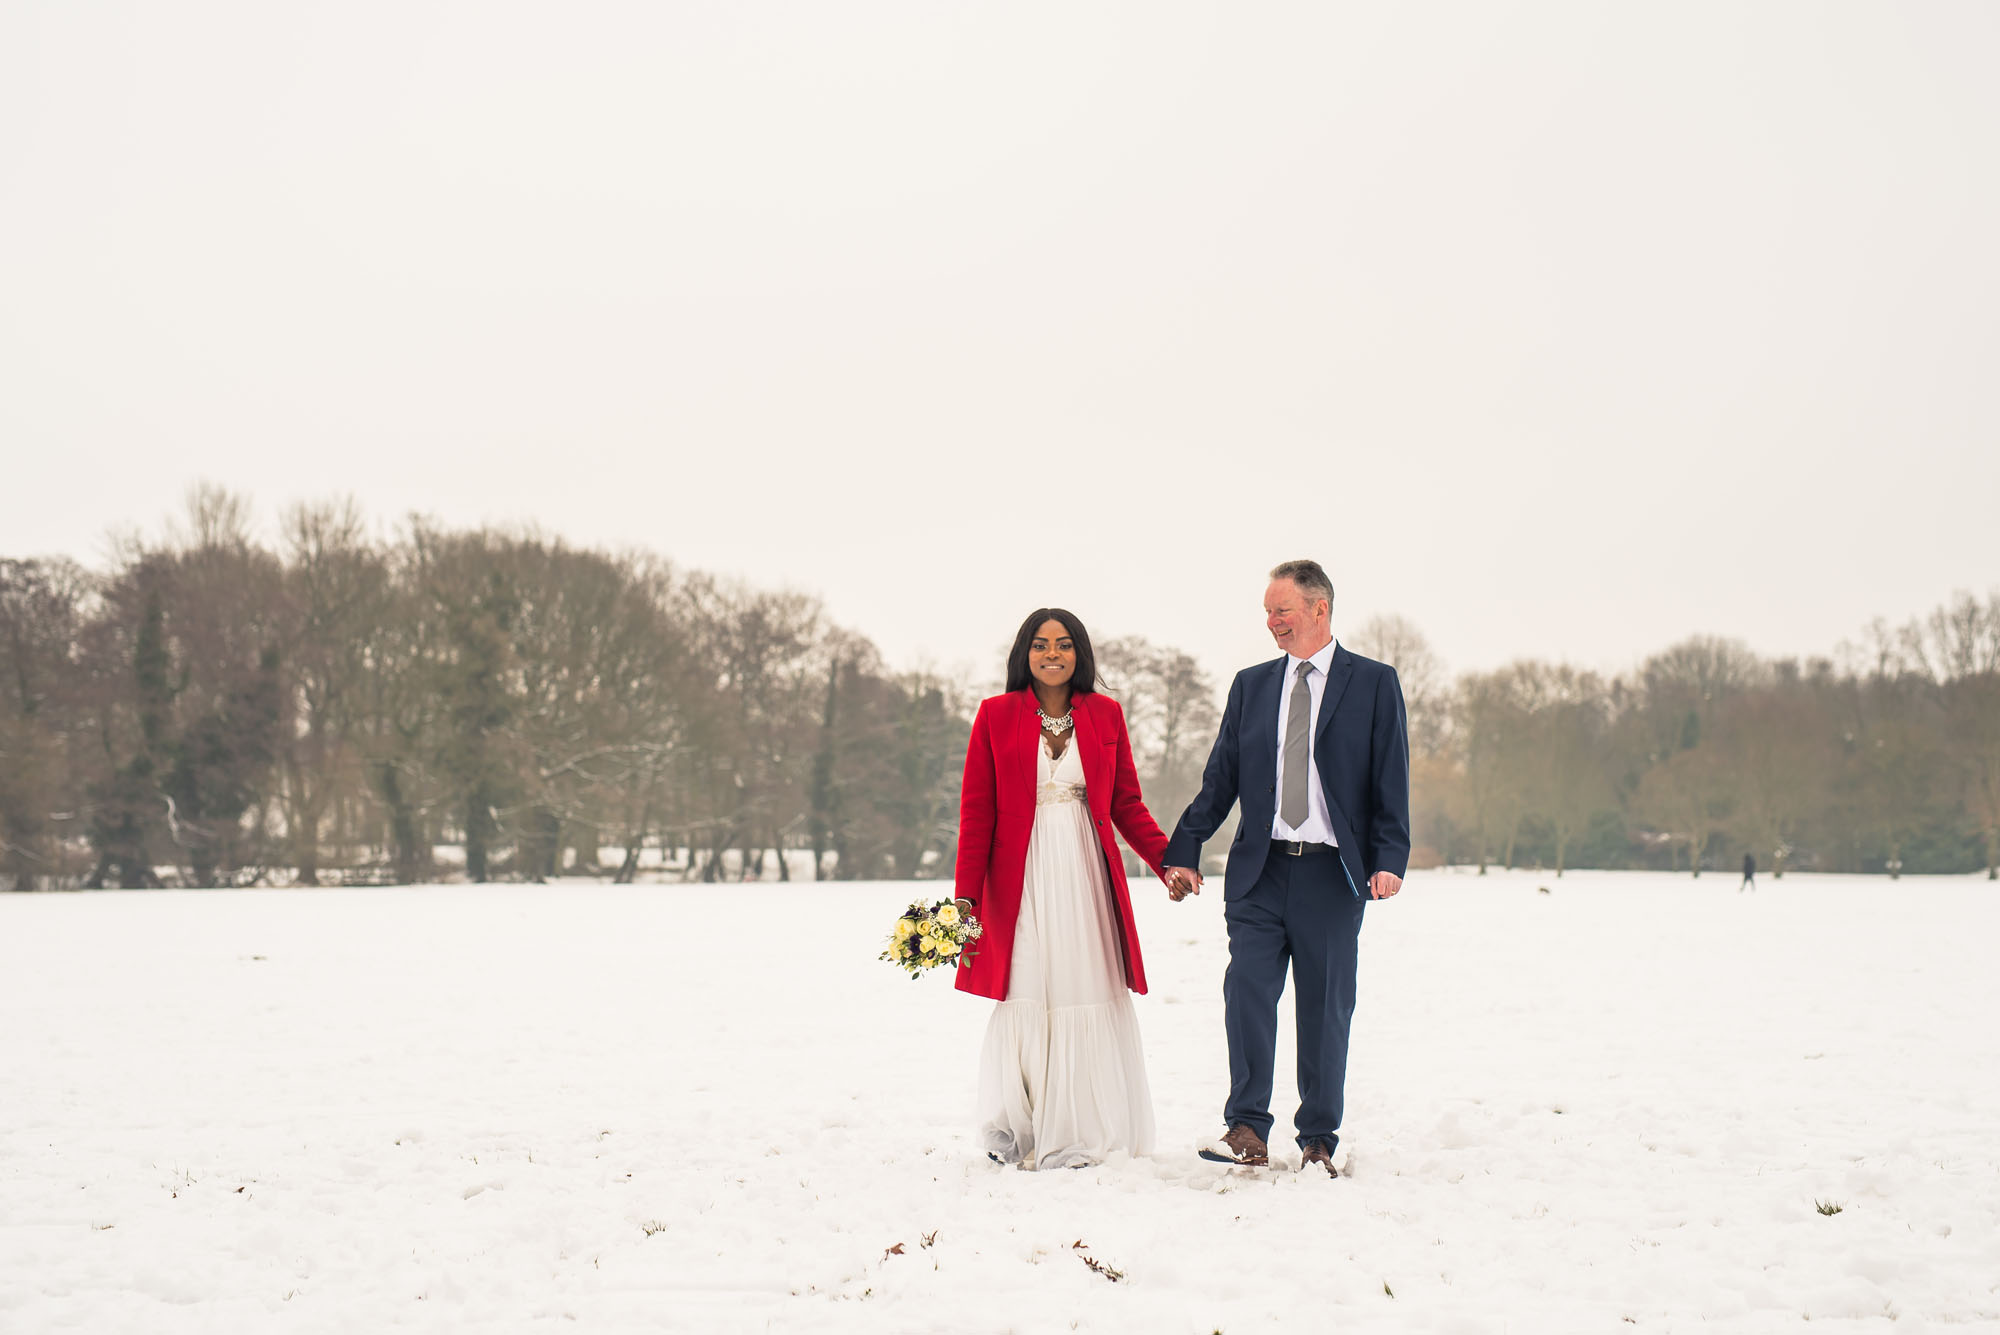 Nick and Edna wedding photos (95 of 113).jpg